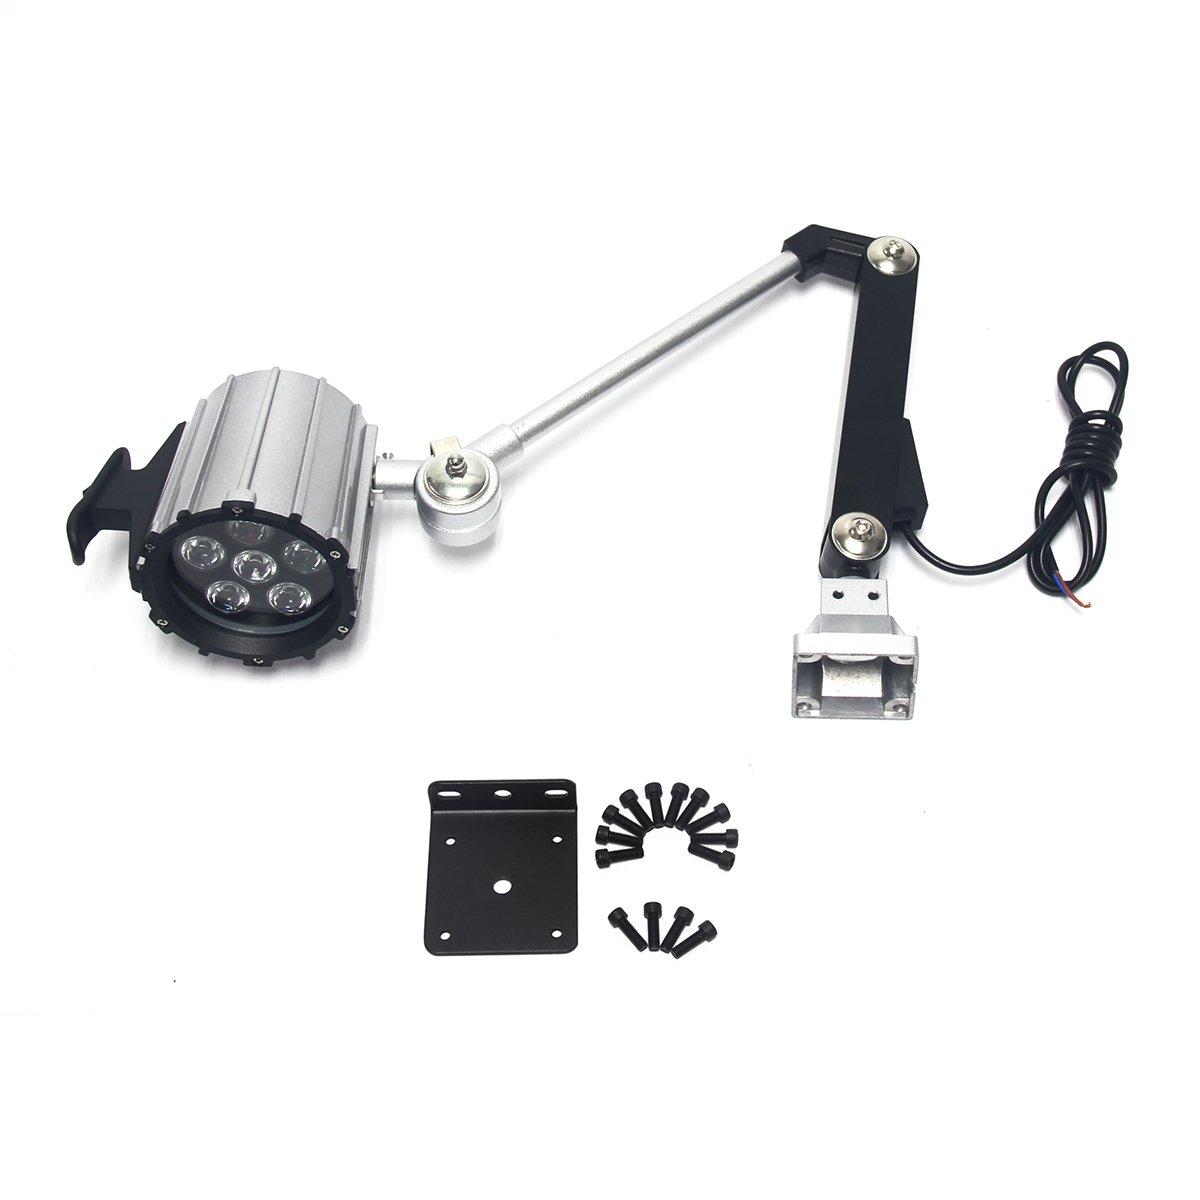 Wisamic LED Work Light for Lathe, CNC Milling Machine, Drilling Machine, Aluminum Alloy, 12W 110V-220V, Adjustable Multipurpose Worklight, Long Arm by WISAMIC (Image #7)